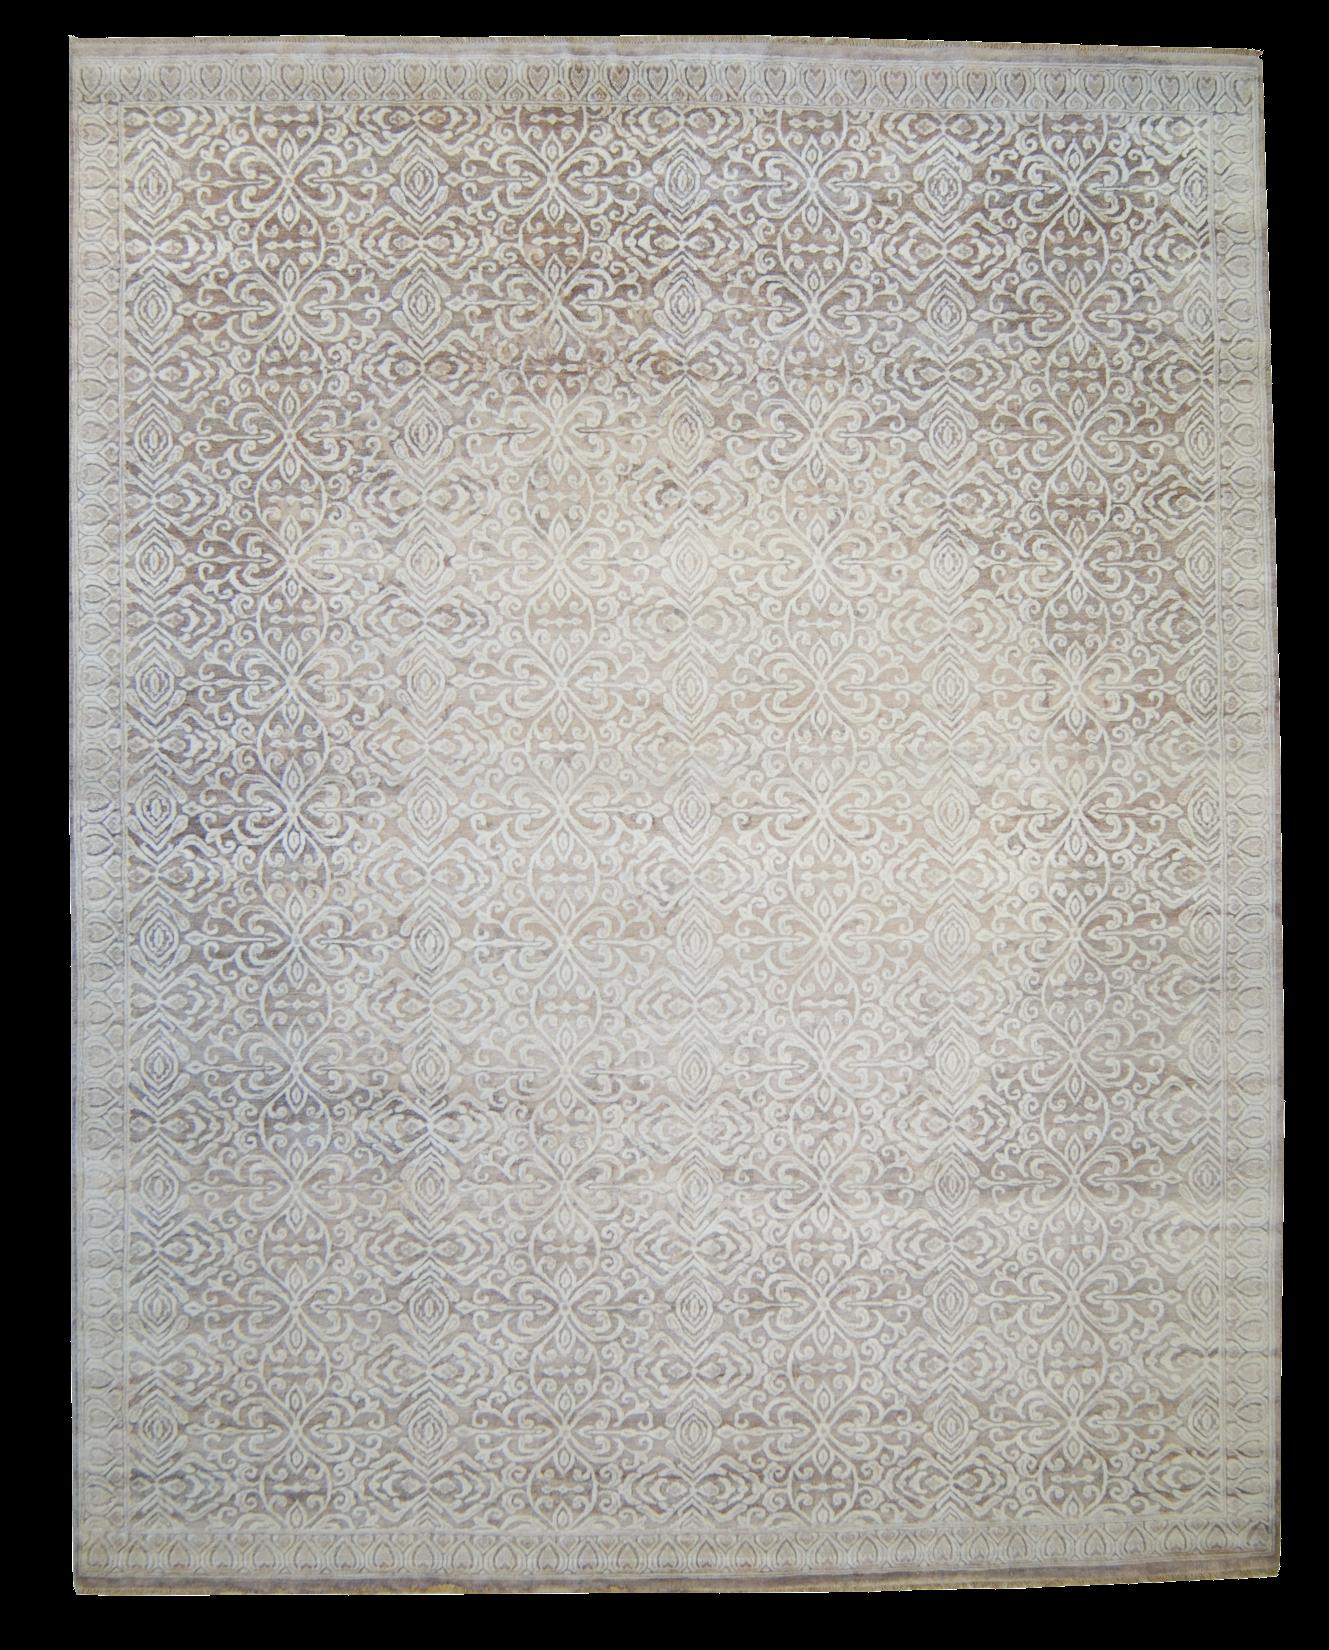 Crema: Nuova Sede Morandi tappeti